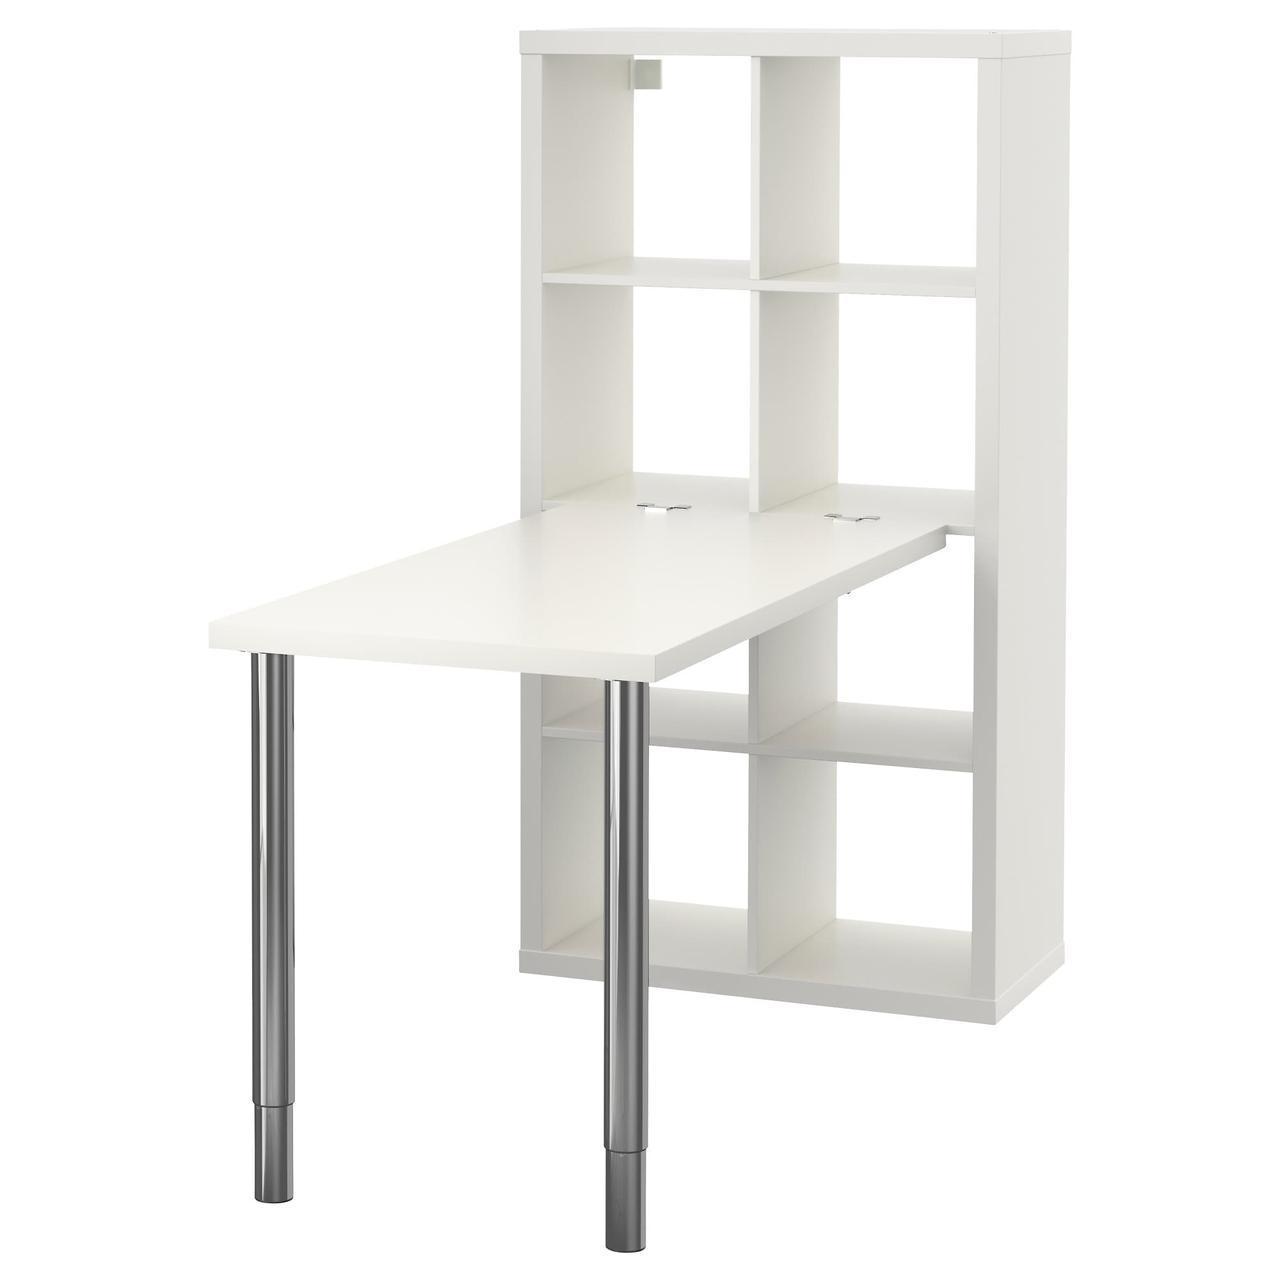 Ikea Kallax 59046553 письменный стол белый цена 4 16615 грн